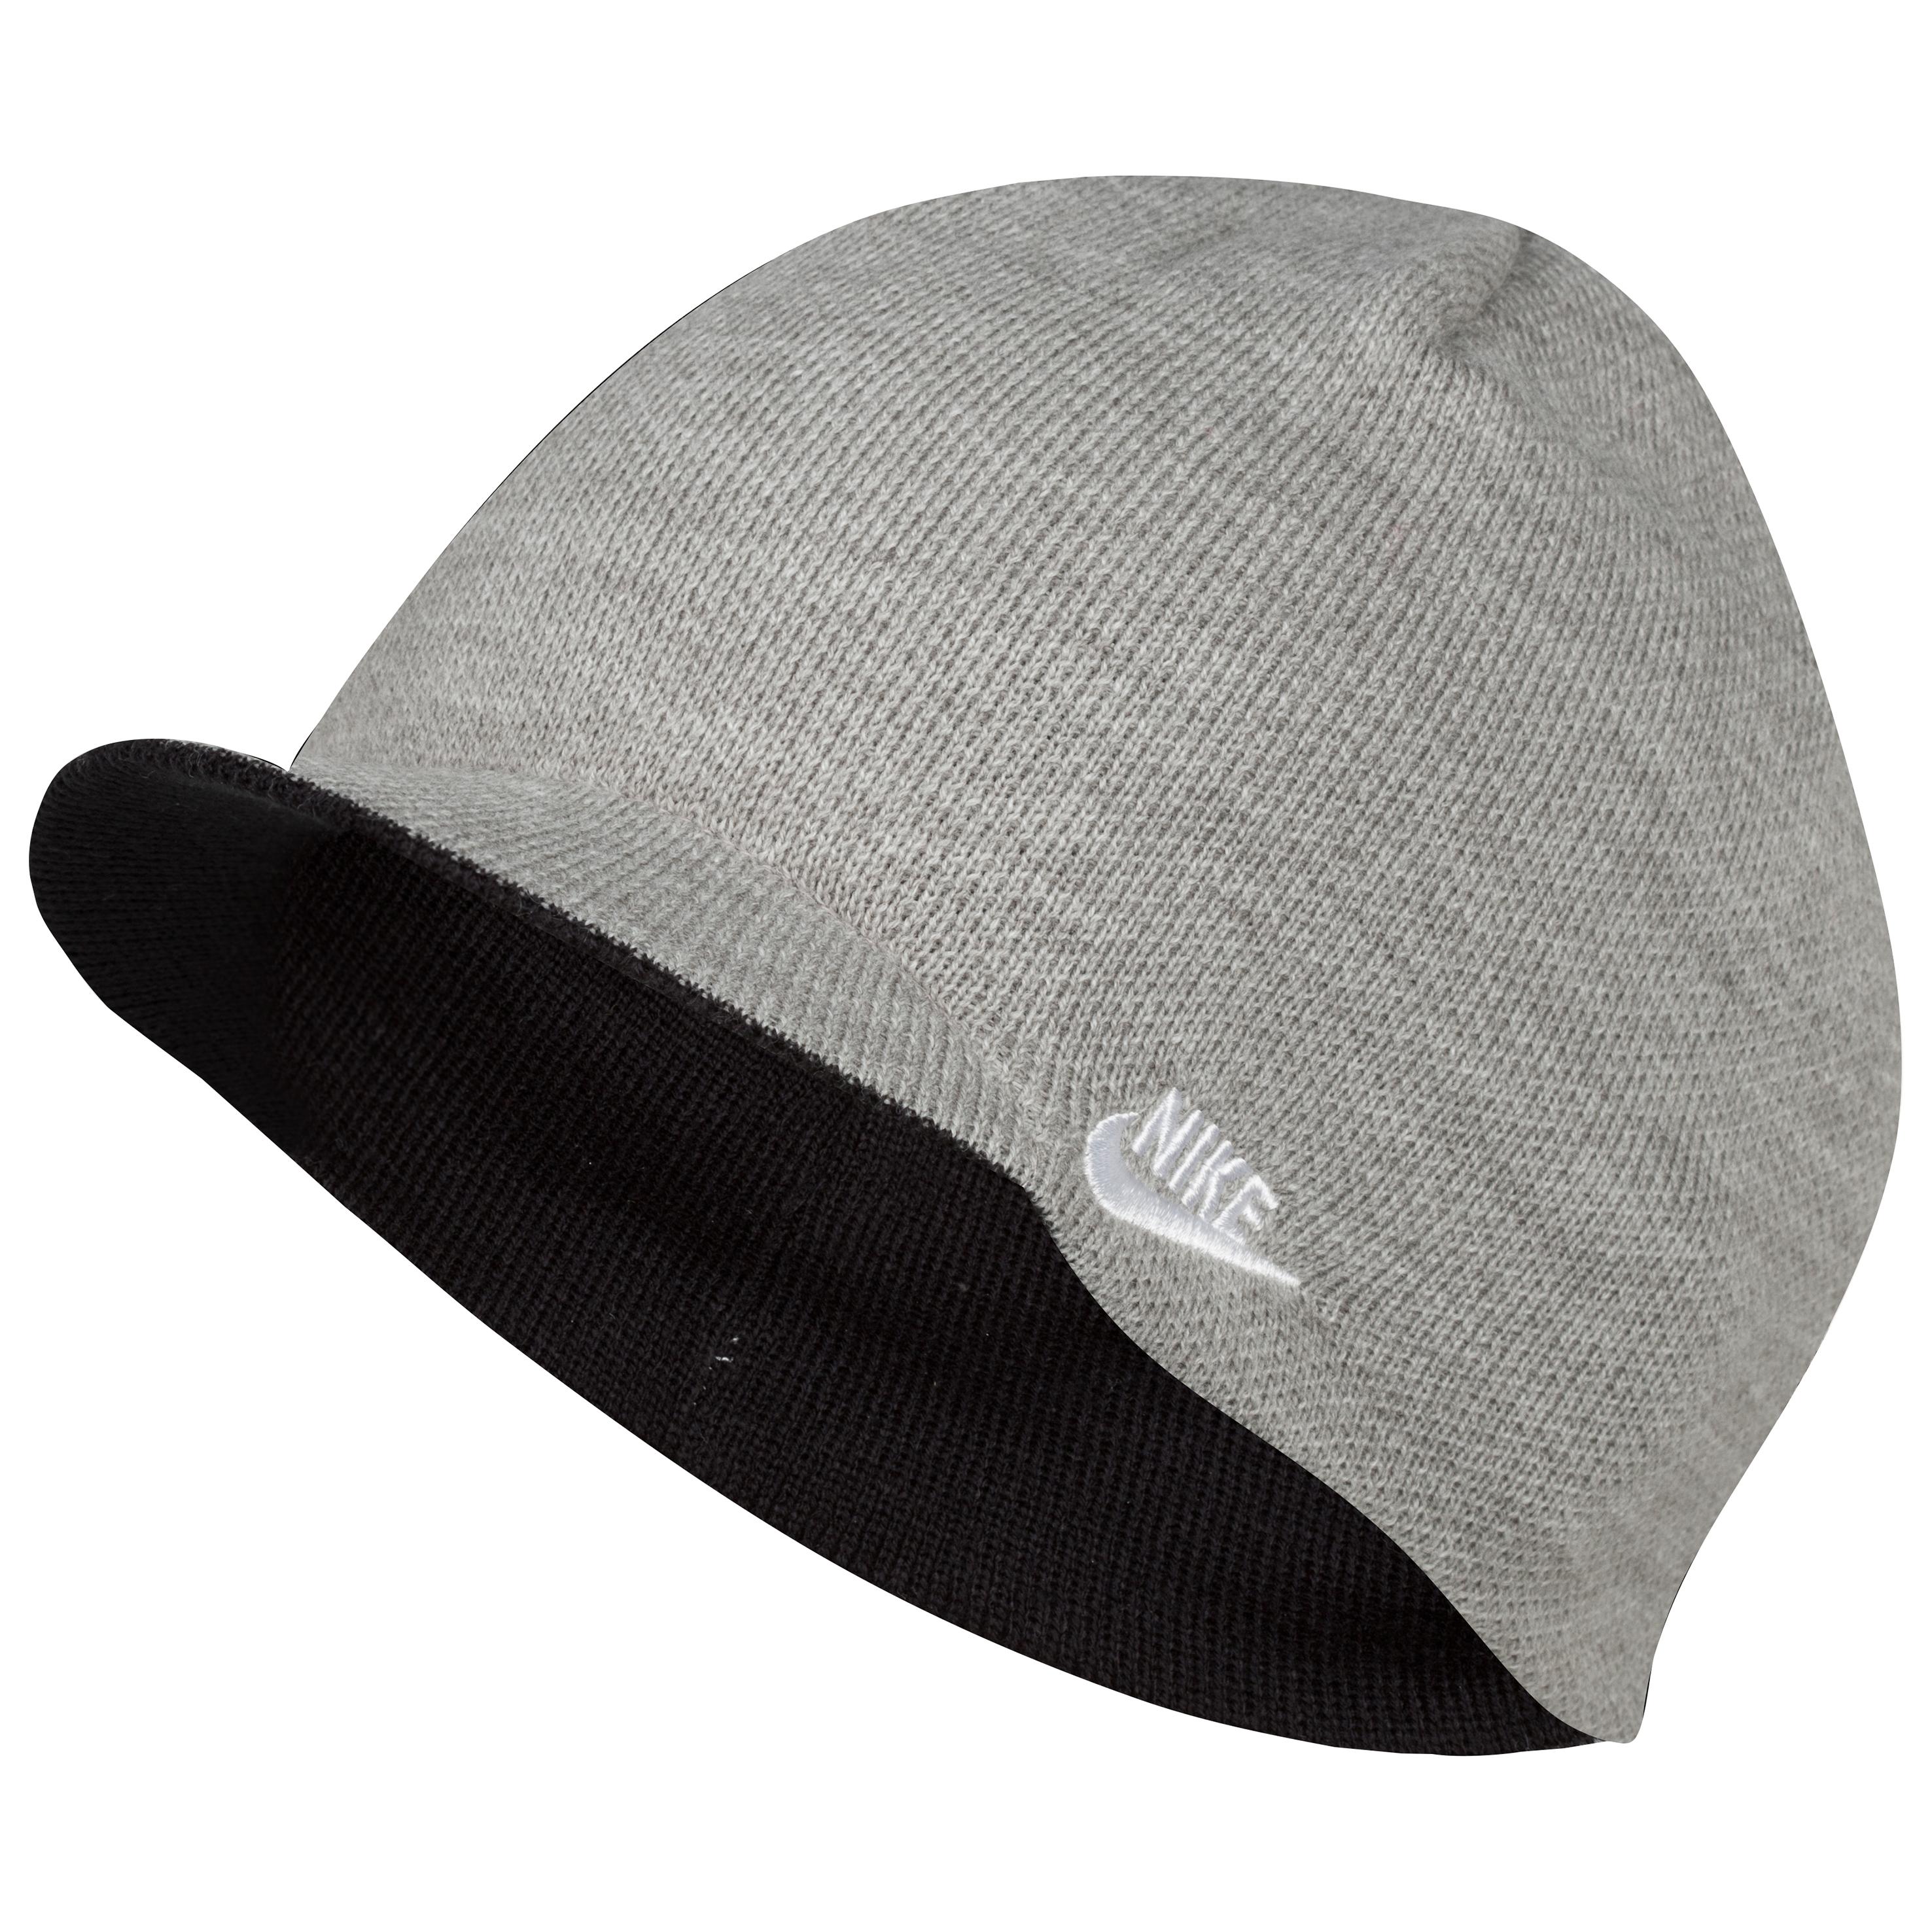 Nike Peaked Futura Beanie - Dark Grey Heather/Black/White